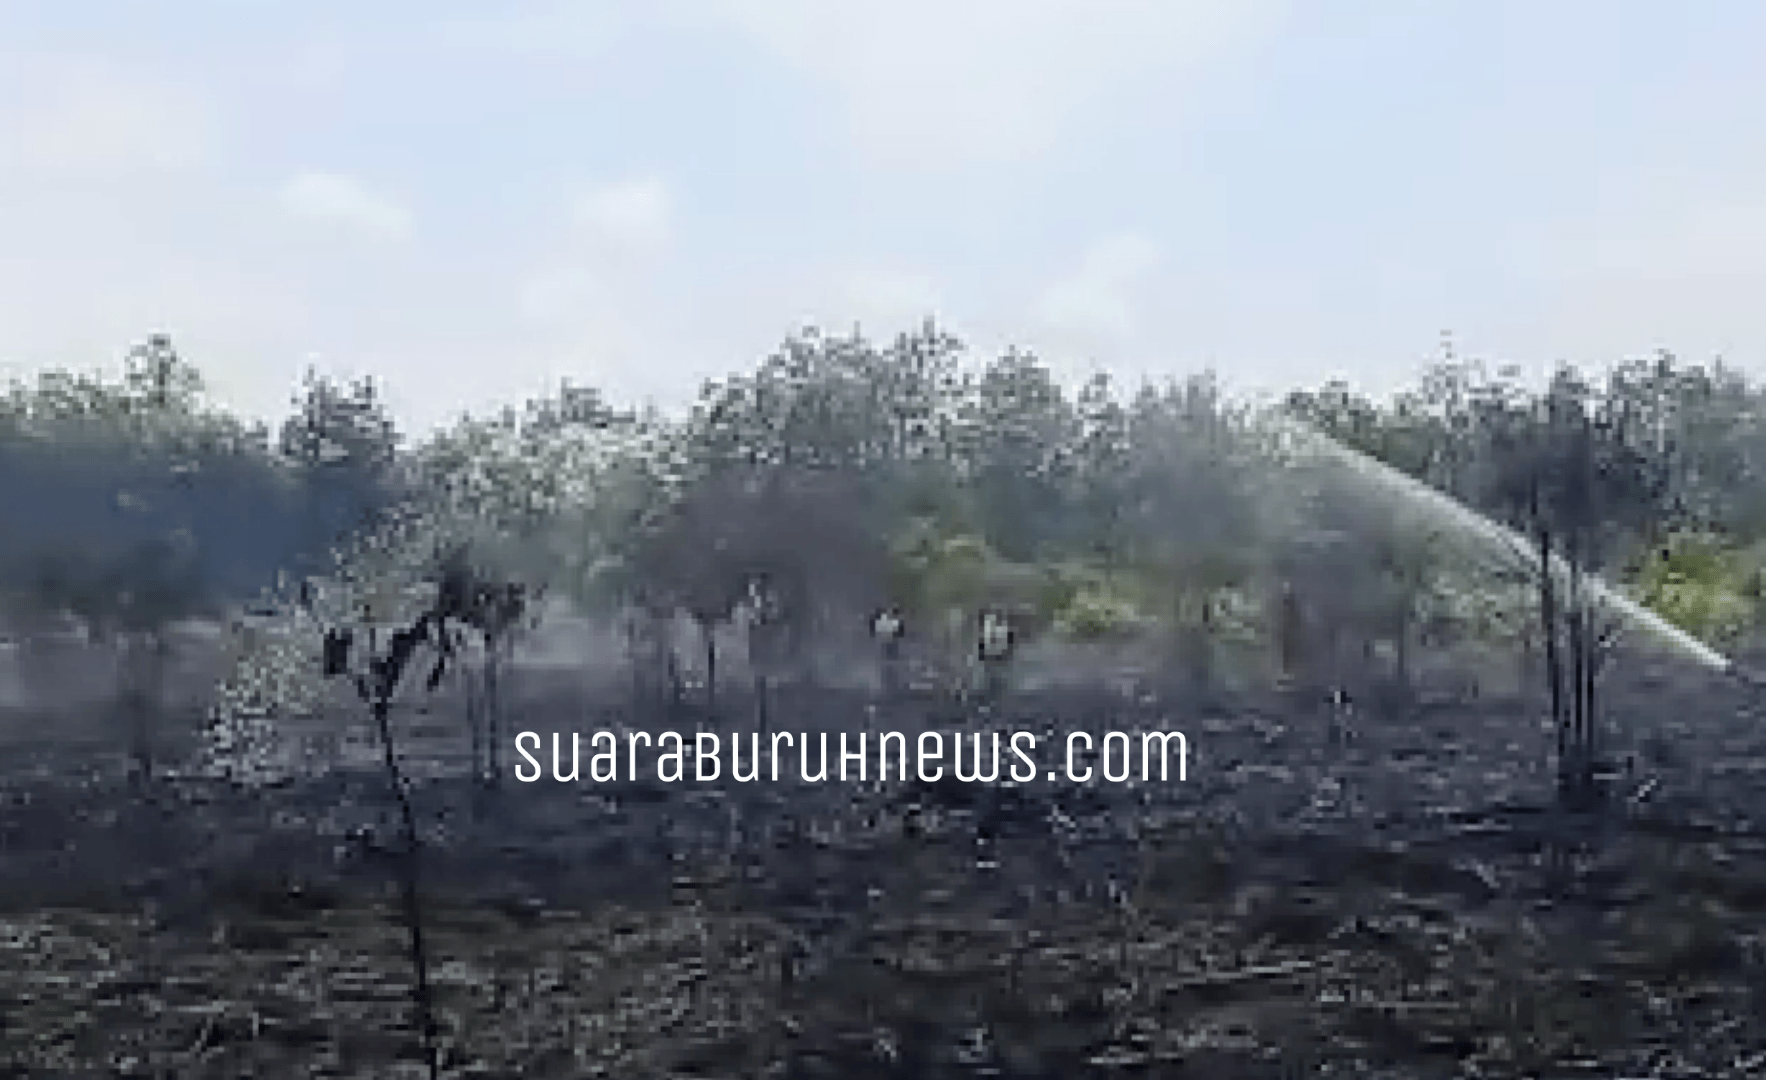 Karhutla Gulung Lahan Desa Gambut Mutiara 100 Hektar